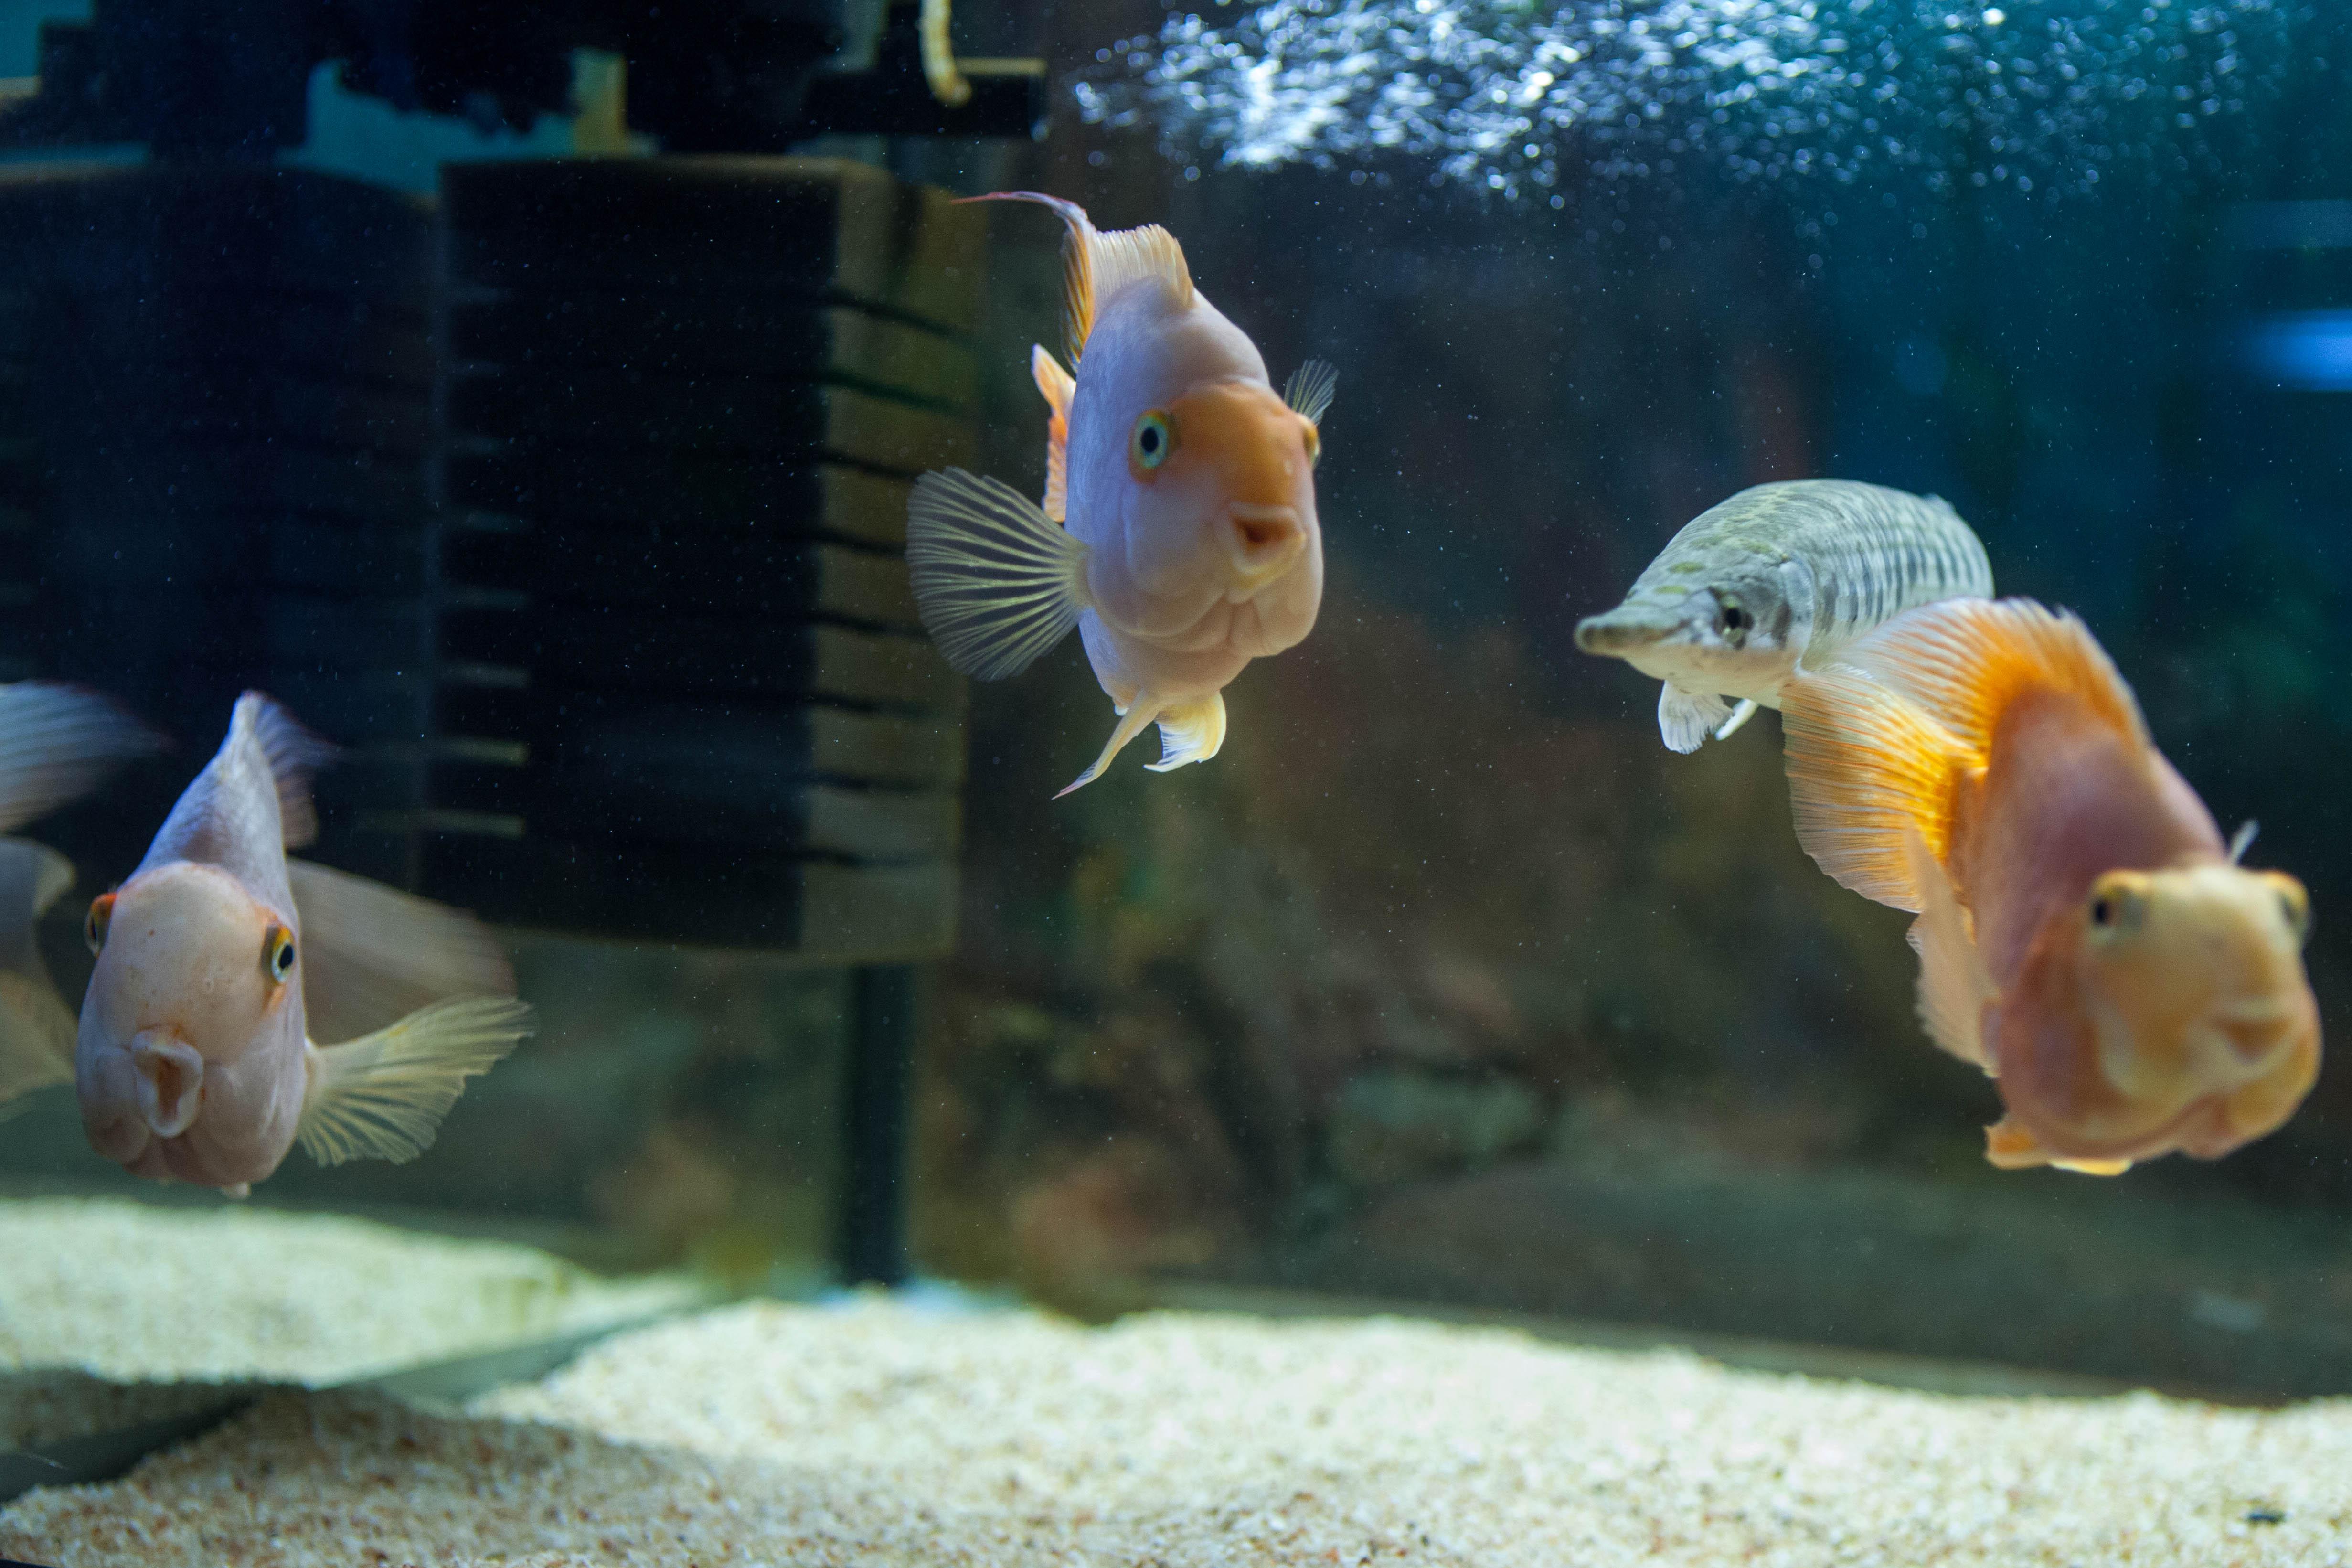 Музей аквариумистики на Арбате. Выставка Живые акулы.